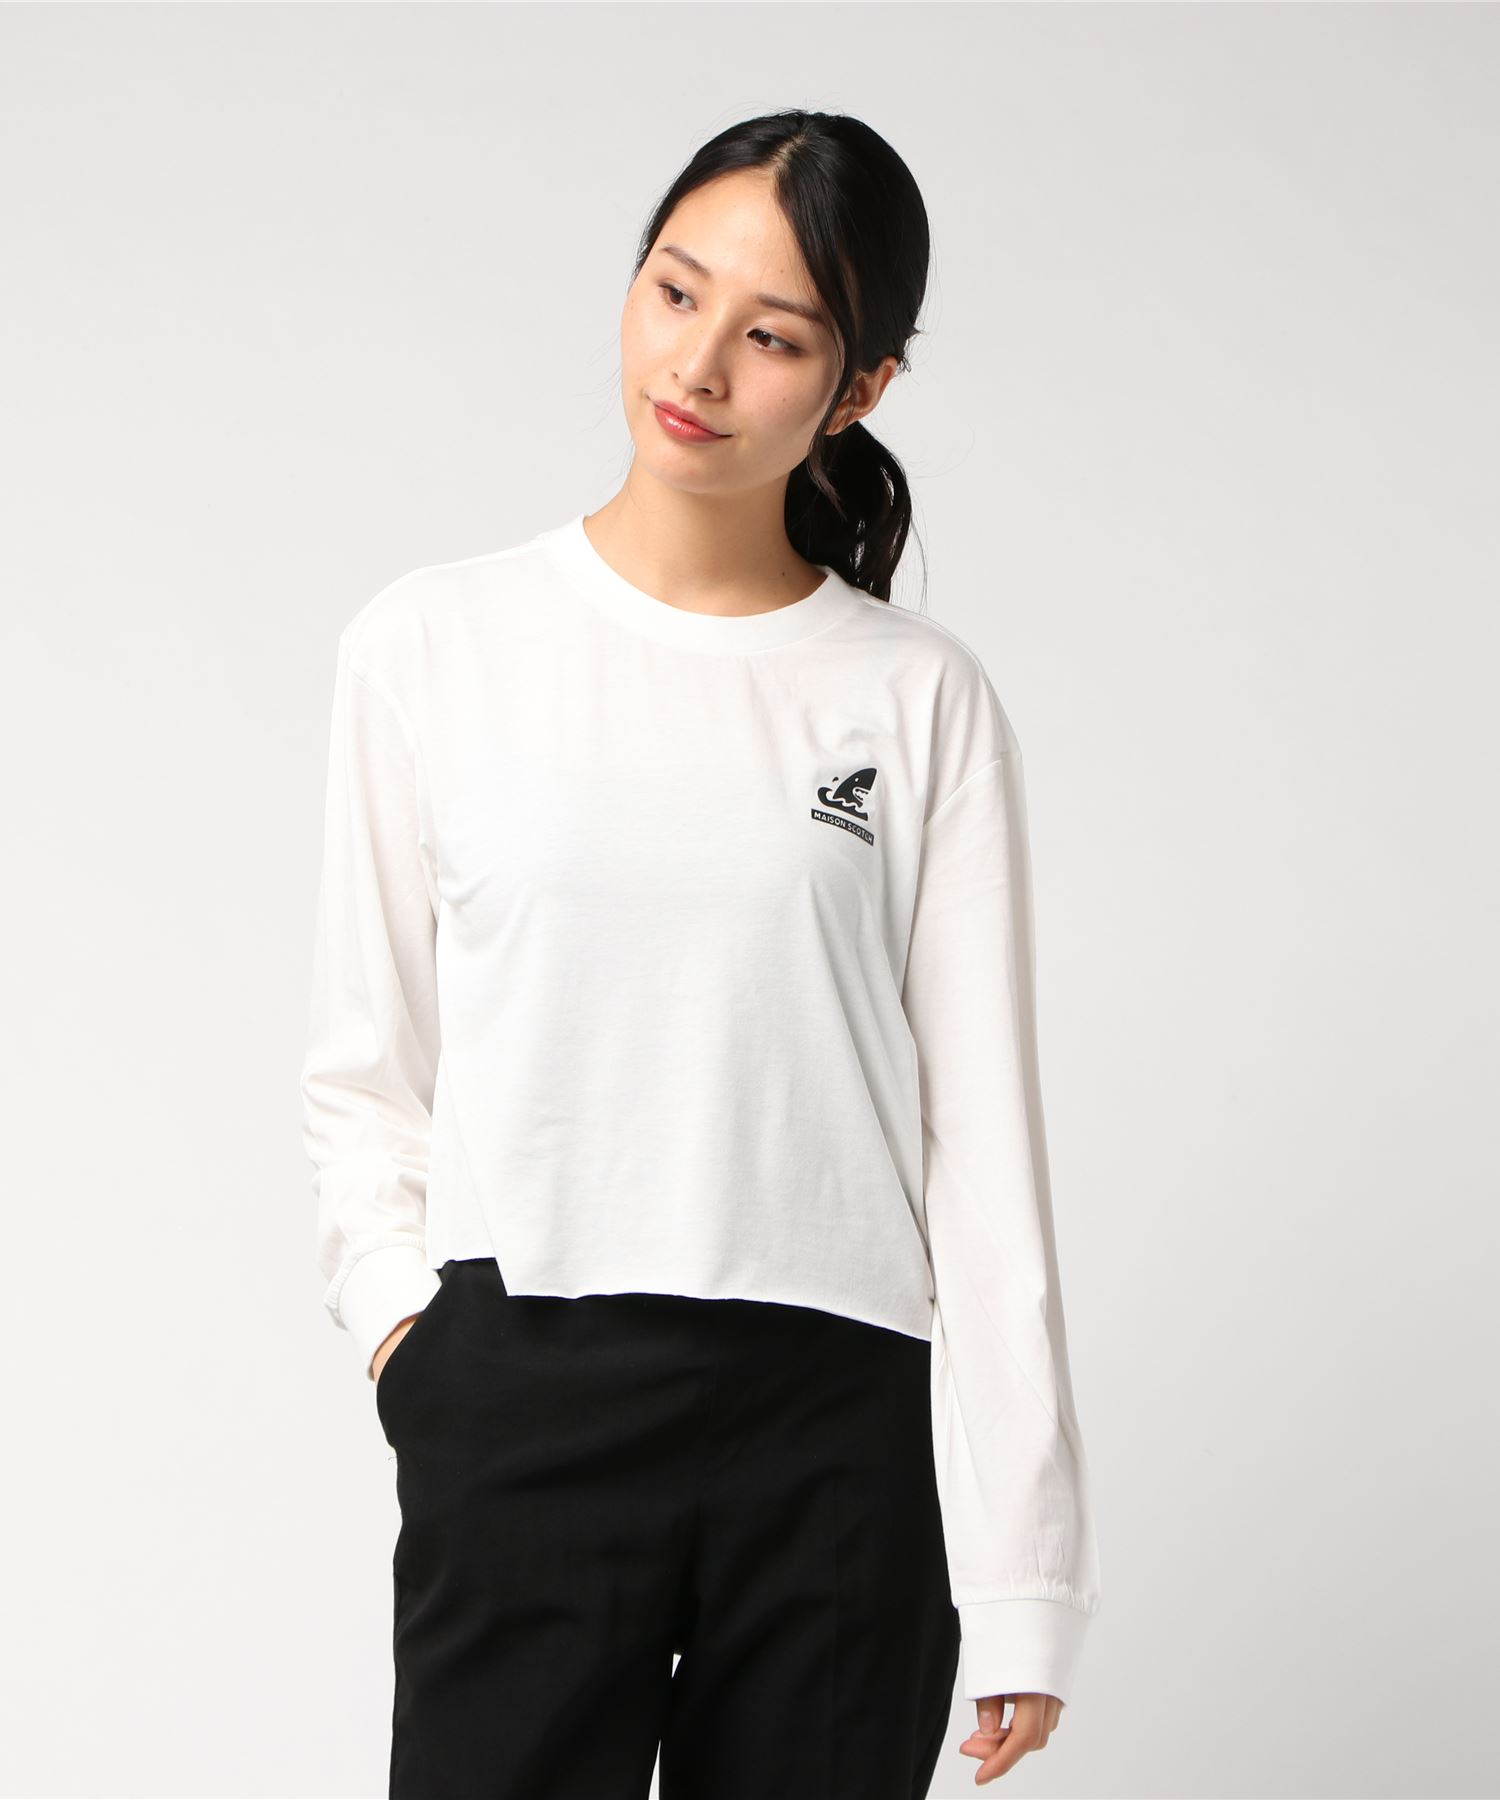 SCOTCH & SODA スコッチアンドソーダ / バックプリントプリントショート丈Tシャツ